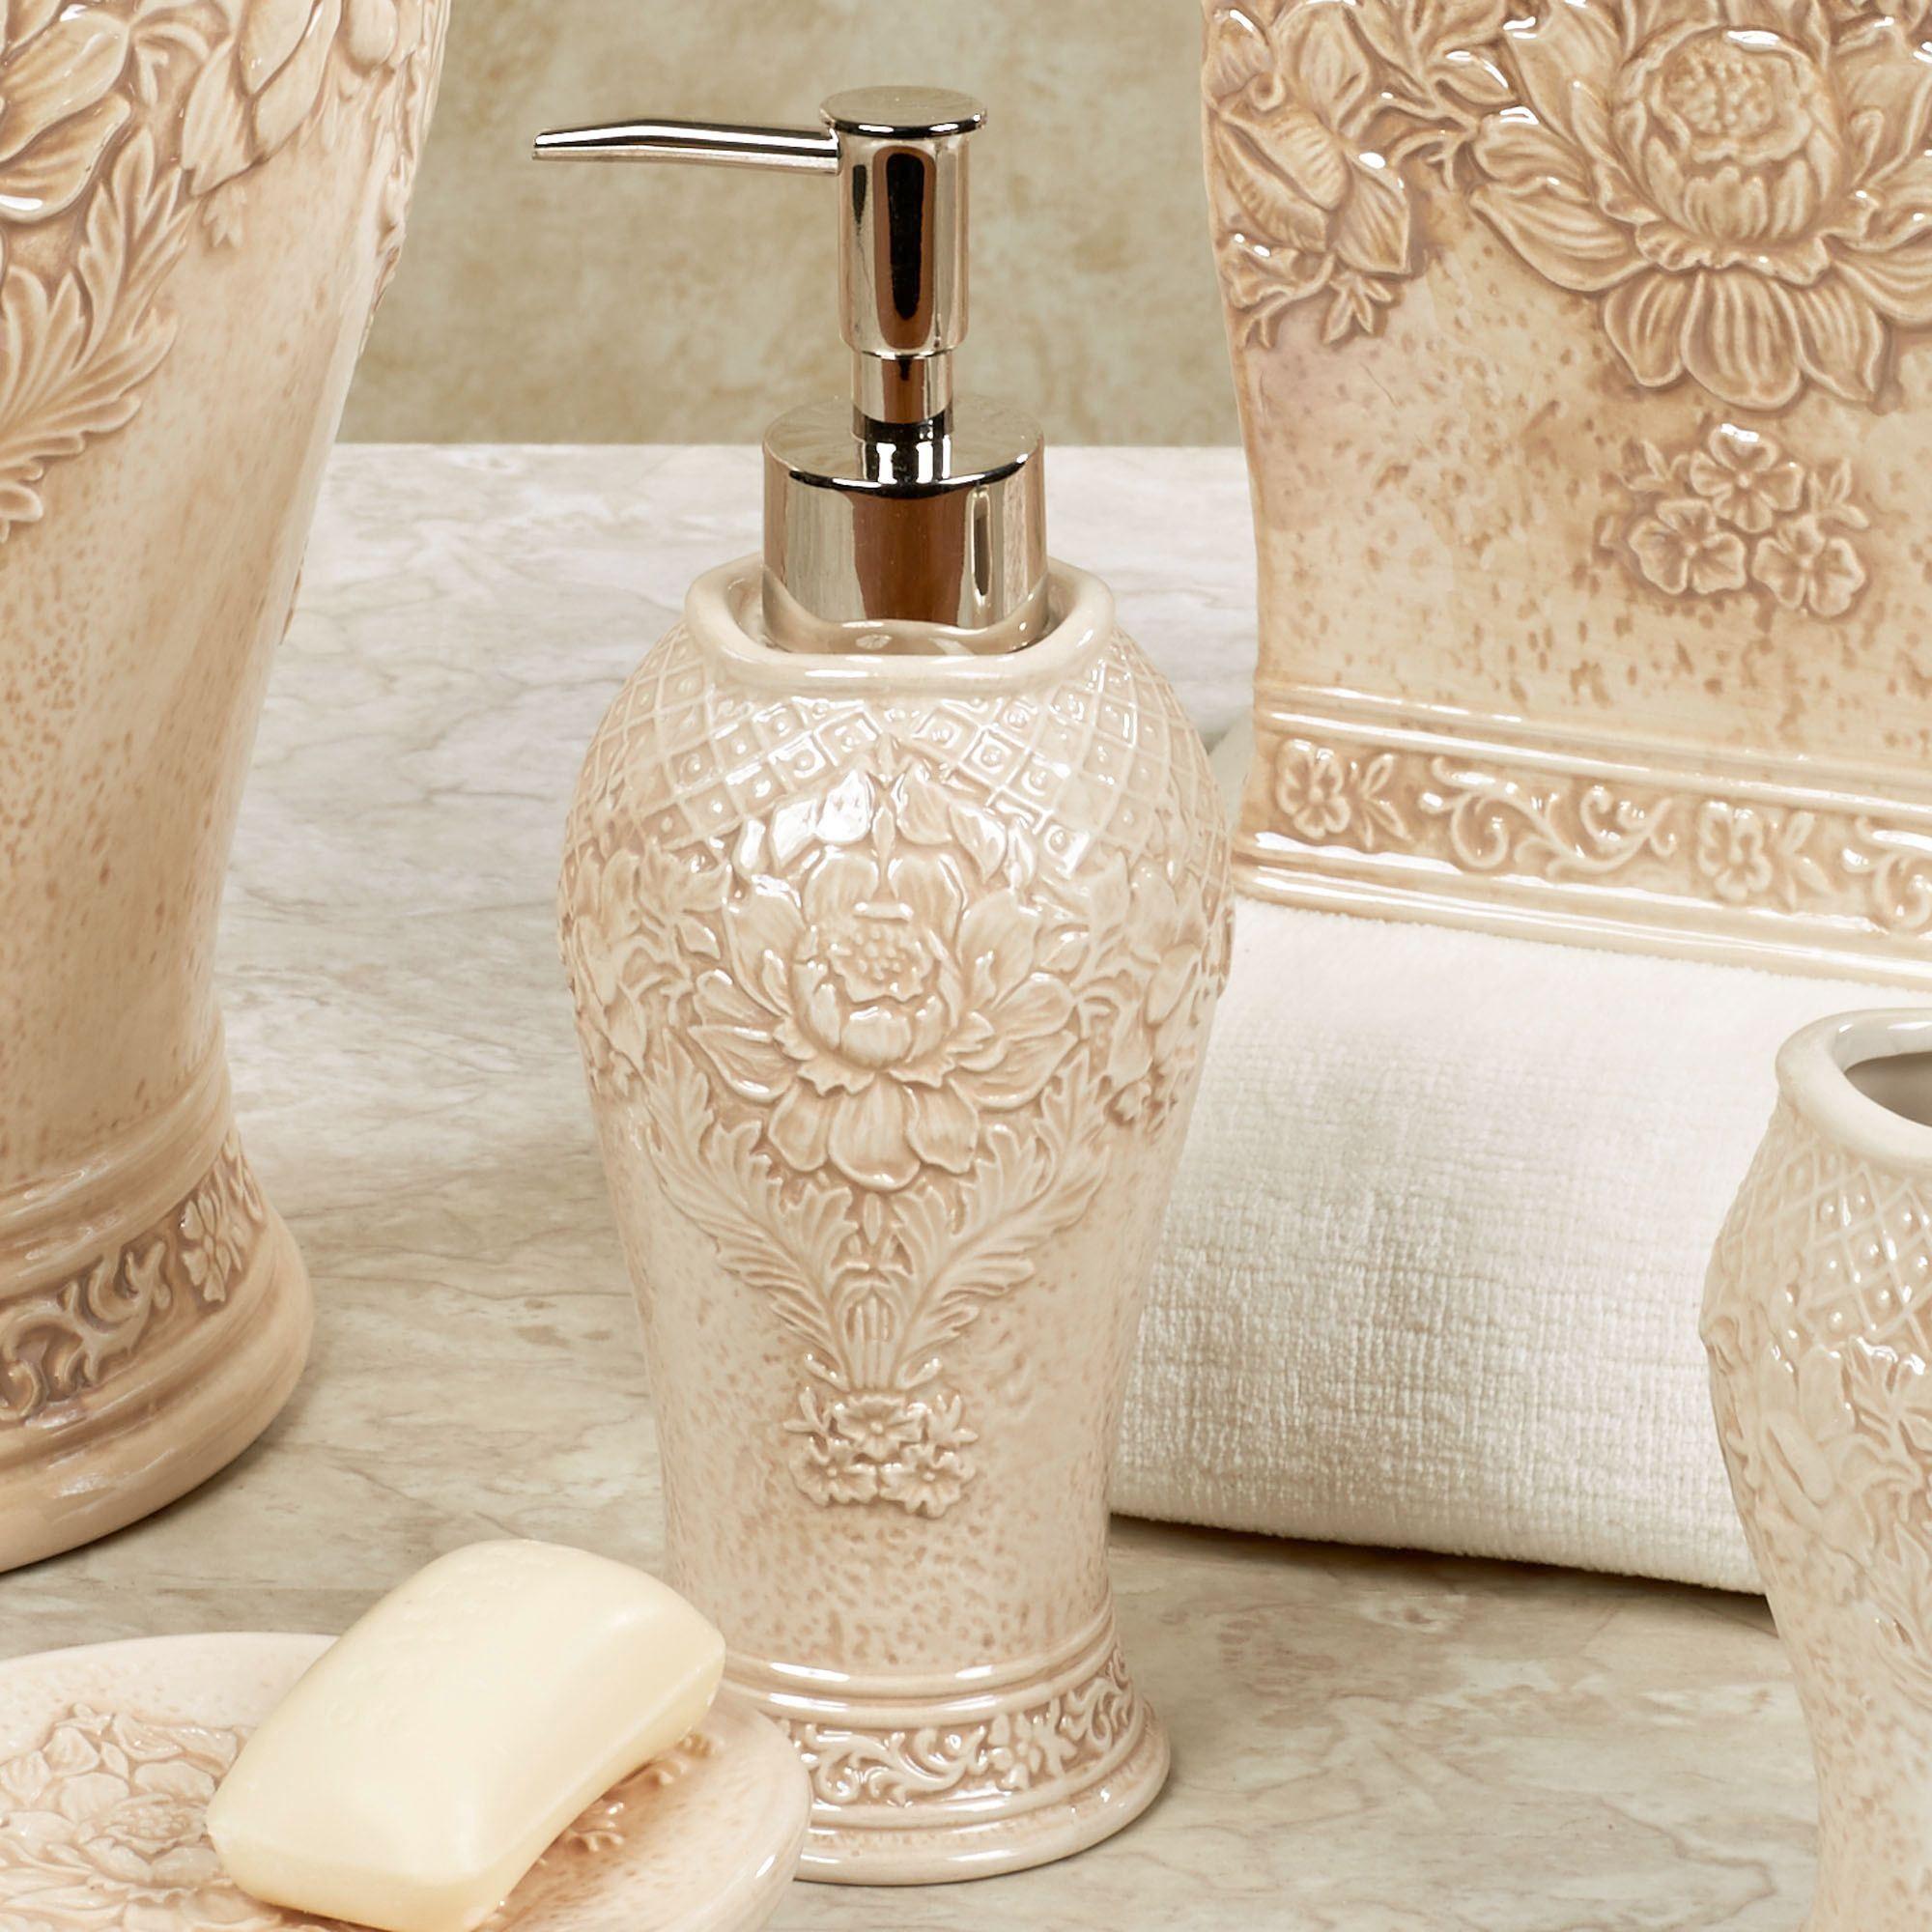 Bianca ceramic floral bath accessories by j queen new york for Ceramic bathroom accessories